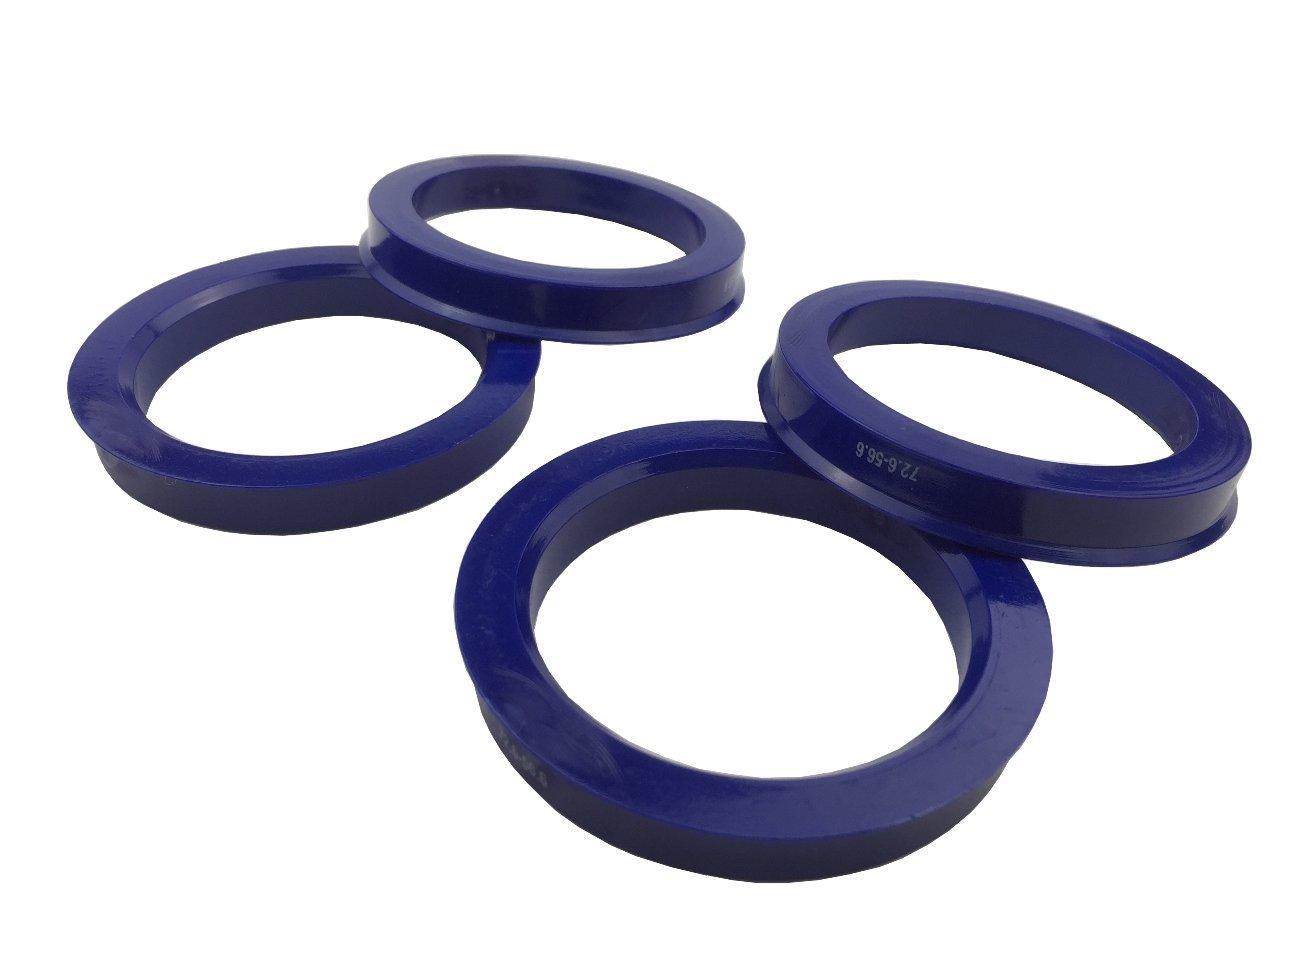 4 Pieces - Hub Centric Rings - 72.6mm OD to 56.6mm ID - Dark Blue Poly Carbon Hub Rings JianDa